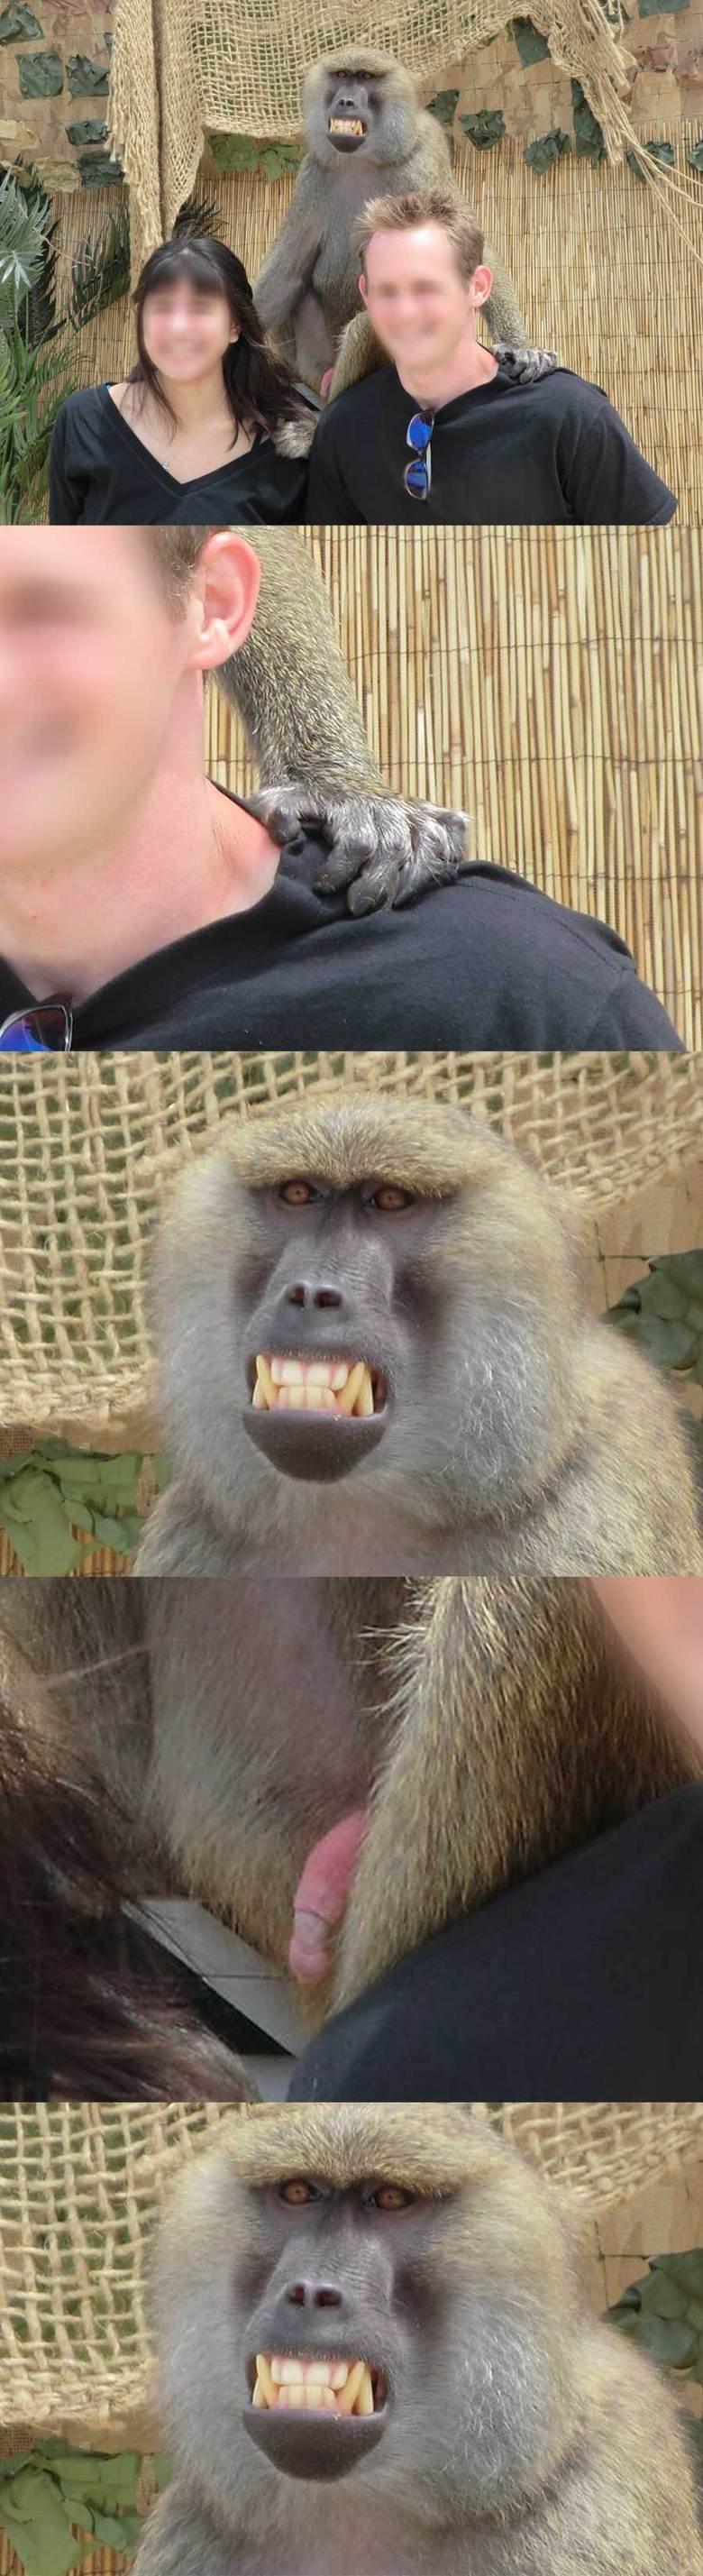 Zooom THREAD. WTF?. funny monkey cool gross interesting laugh meme